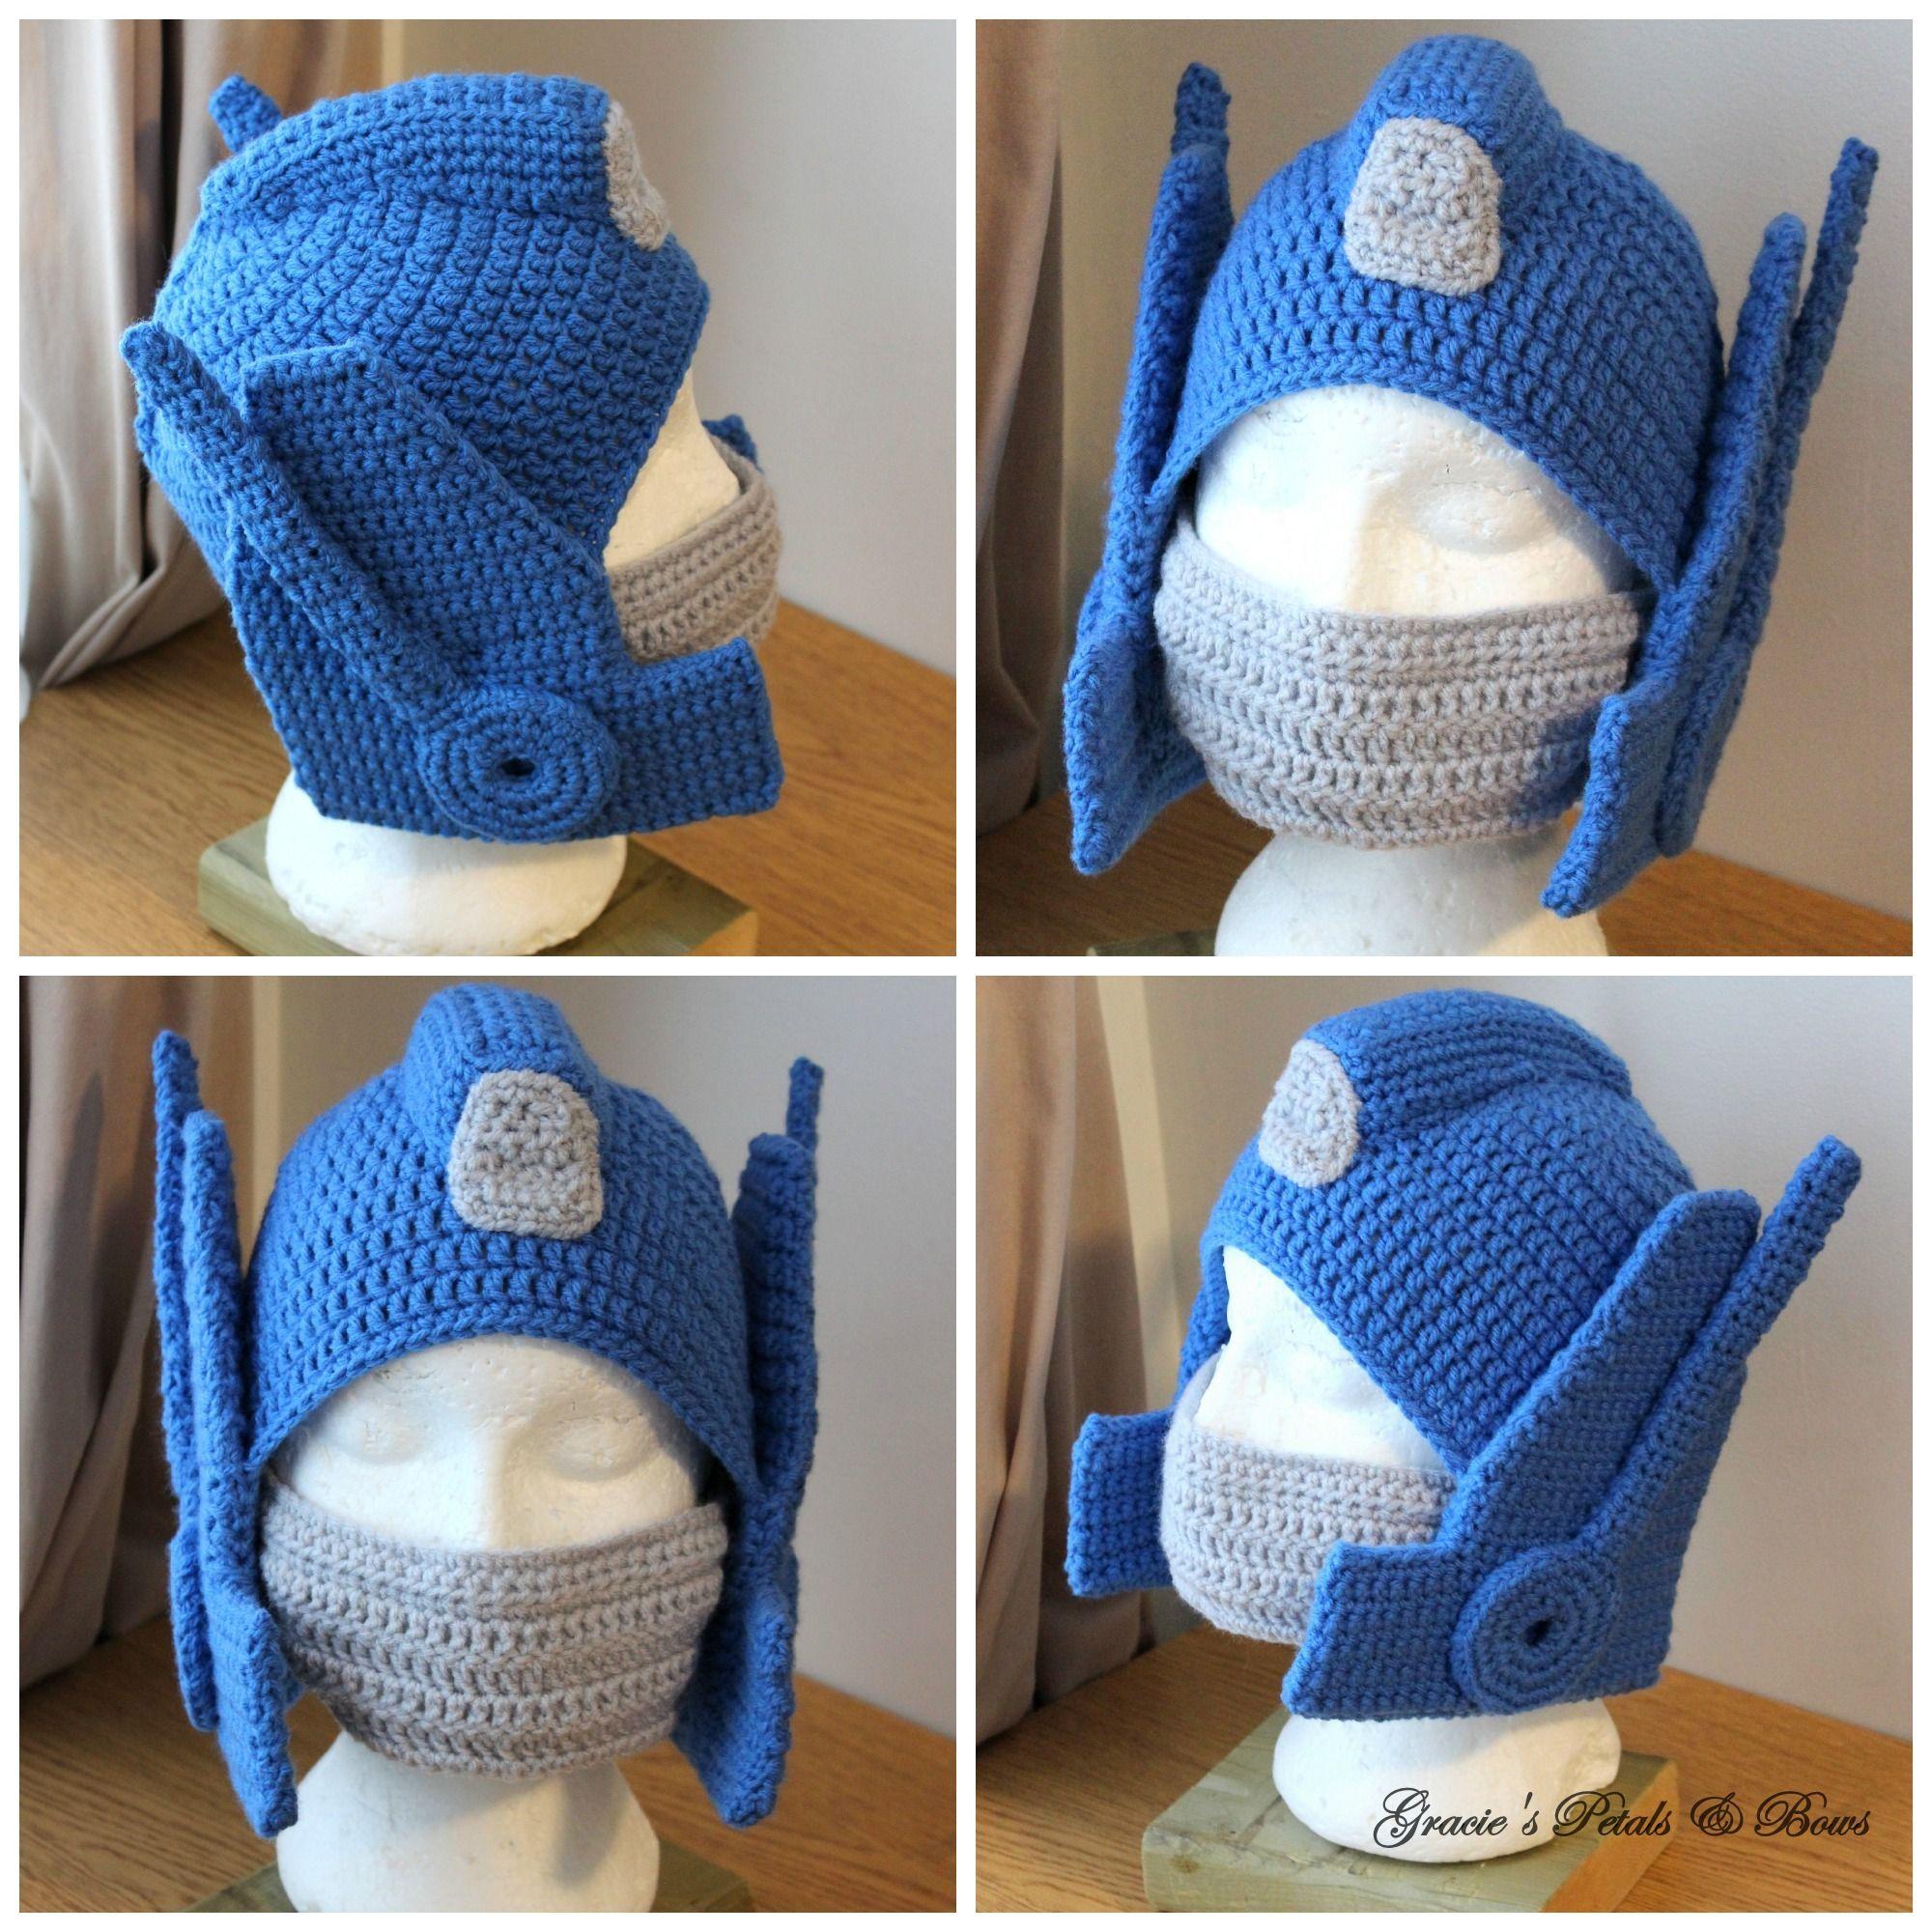 Optimus Prime Inspired Hat Crochet Hats I Make Patrones Gorro